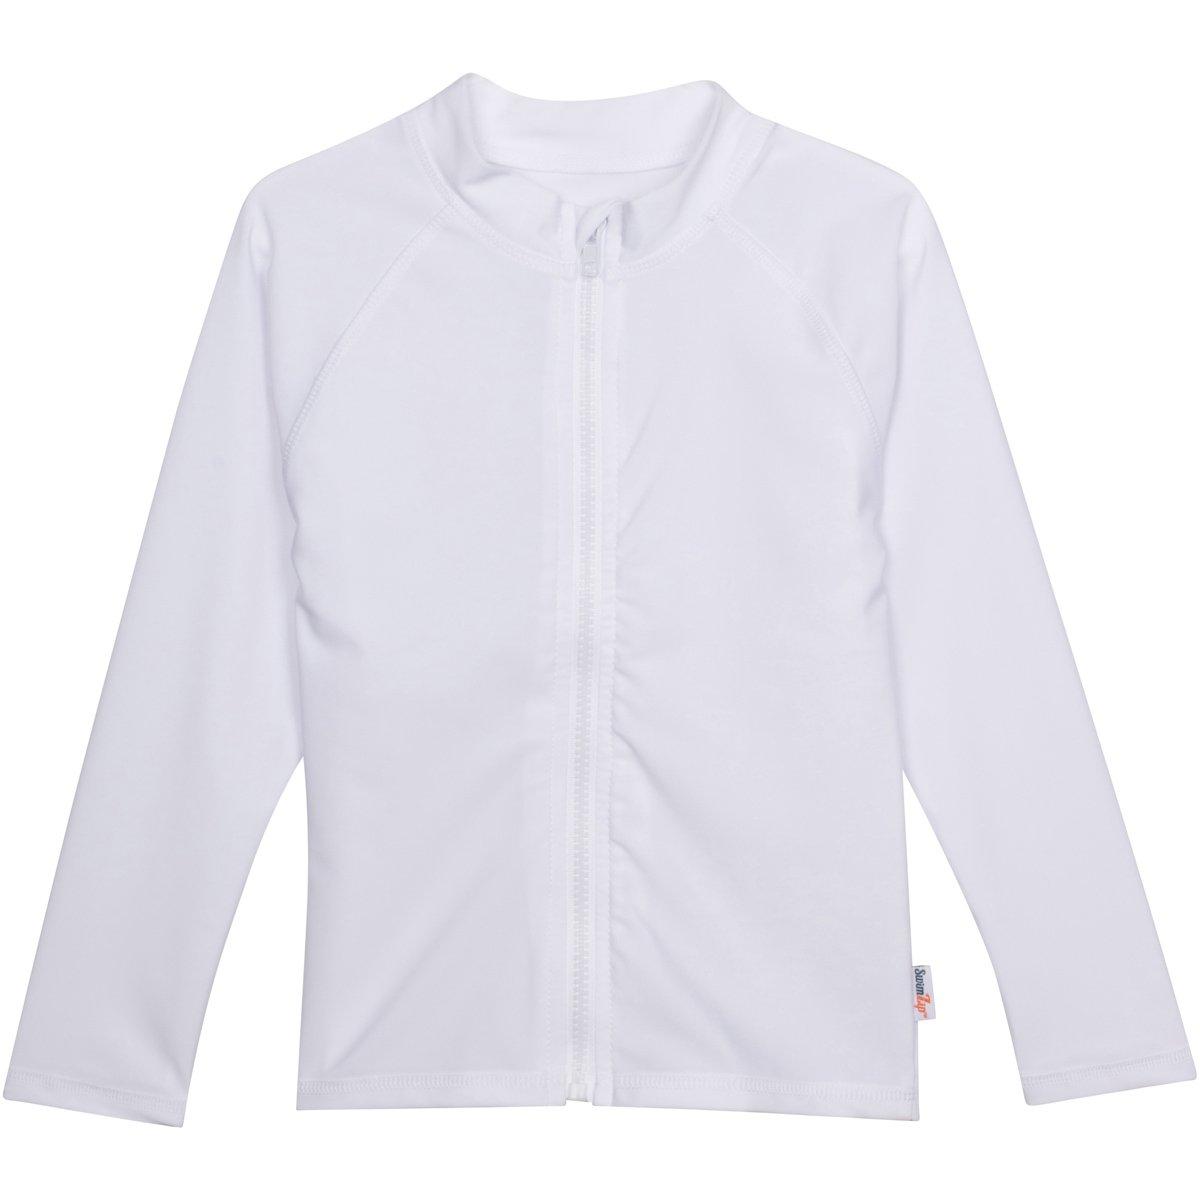 SwimZip Little Boys' Long Sleeve Rashguard Zipper UPF 50+,White,2T